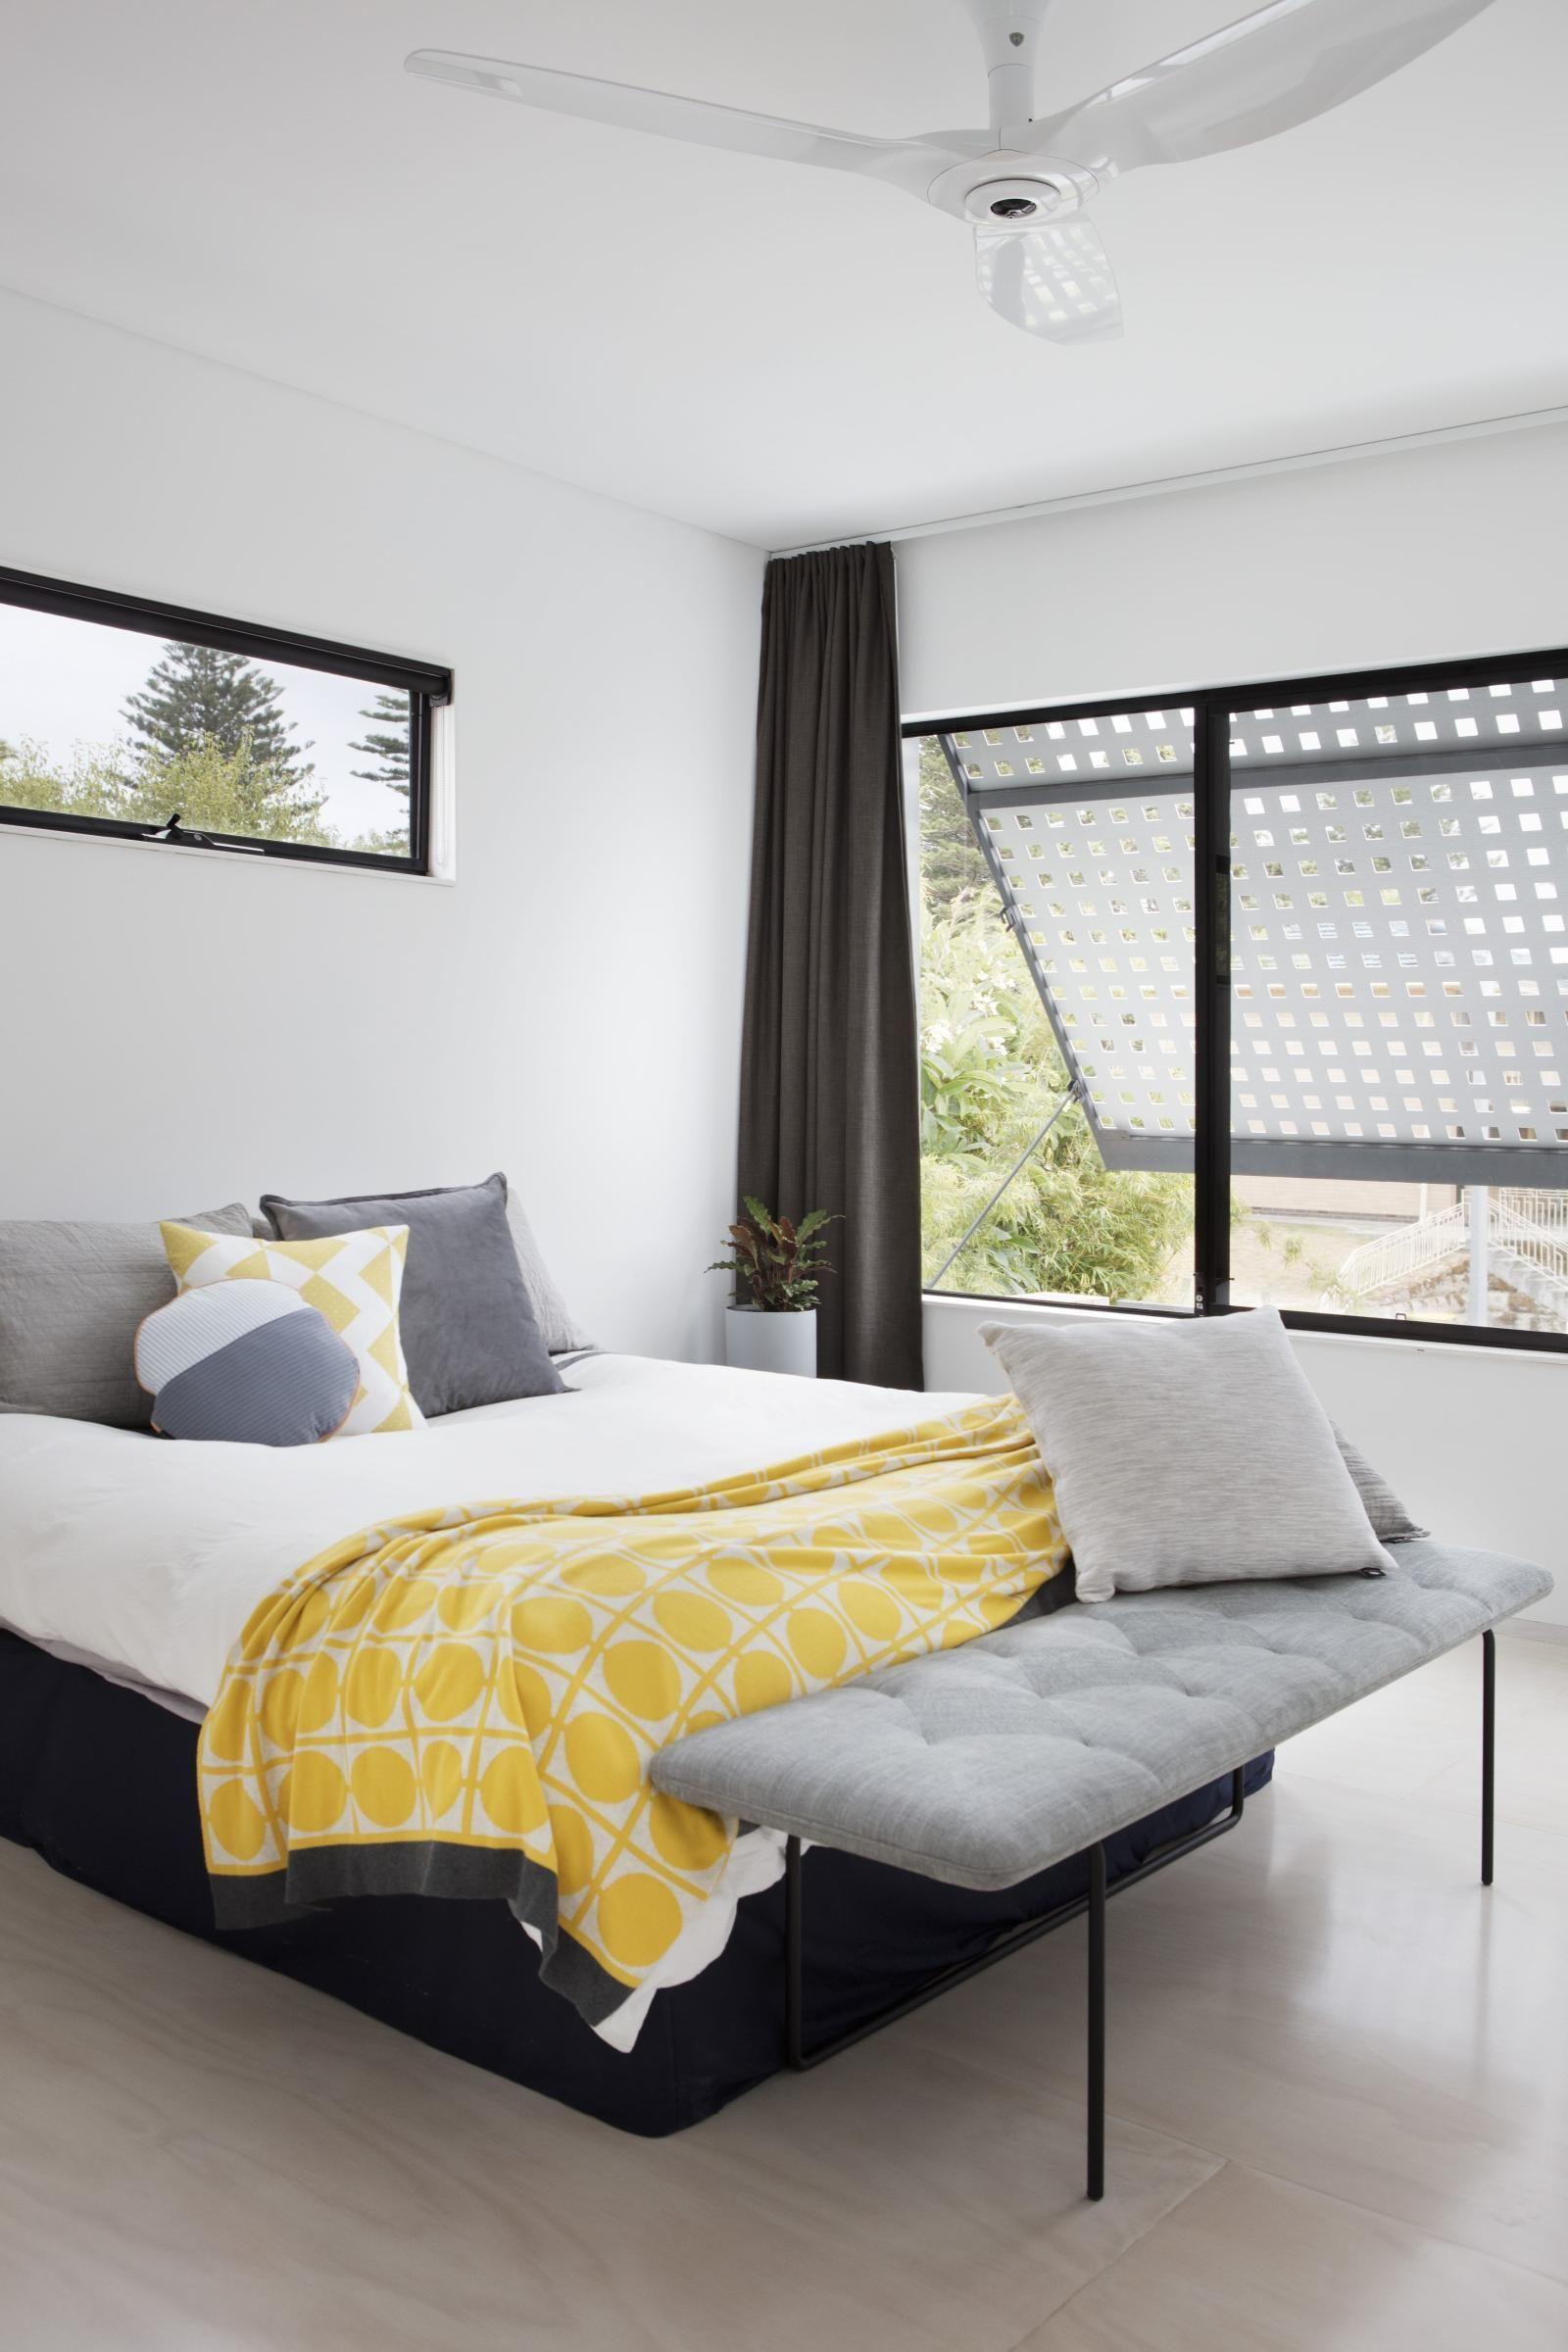 Bedroom Detail  Blinco St Residence By Philip Stejskal Architecture,